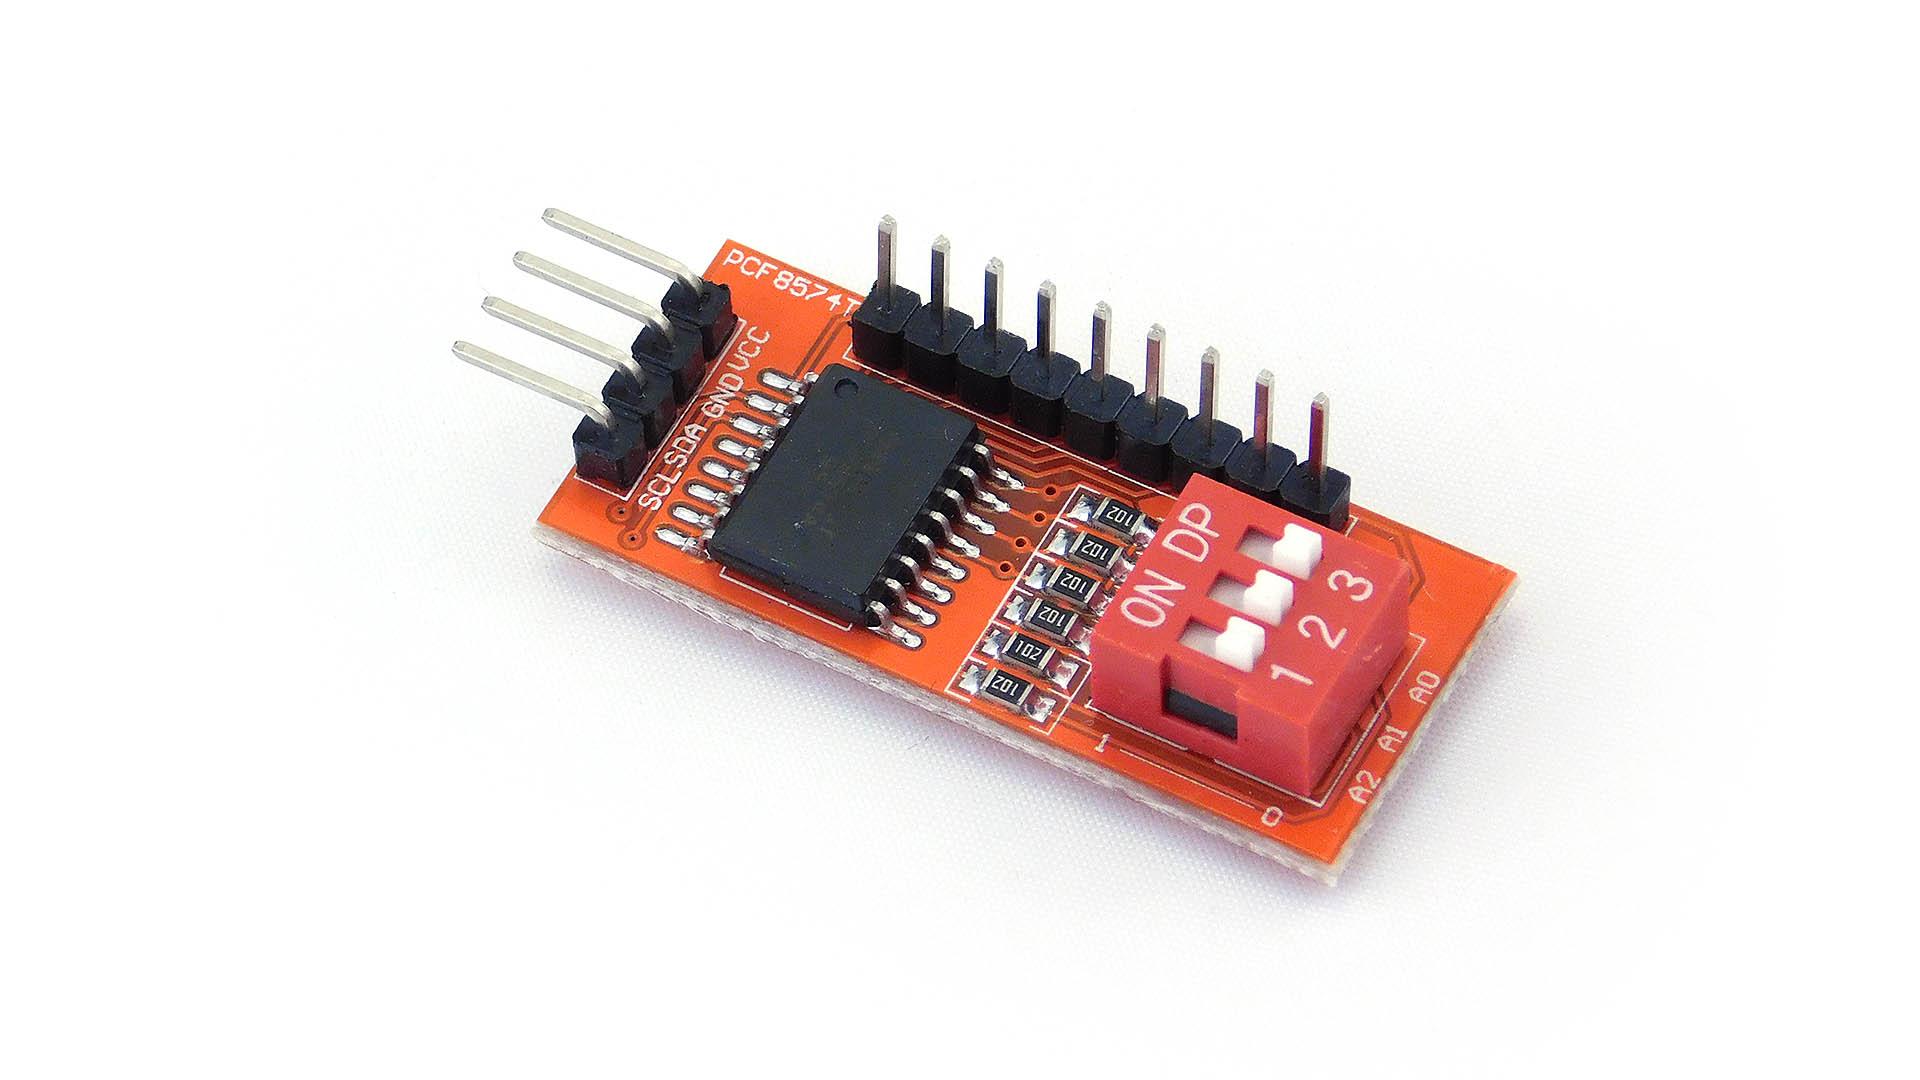 PCF8574 Module - 8-bit I/O Expander for I2C Bus